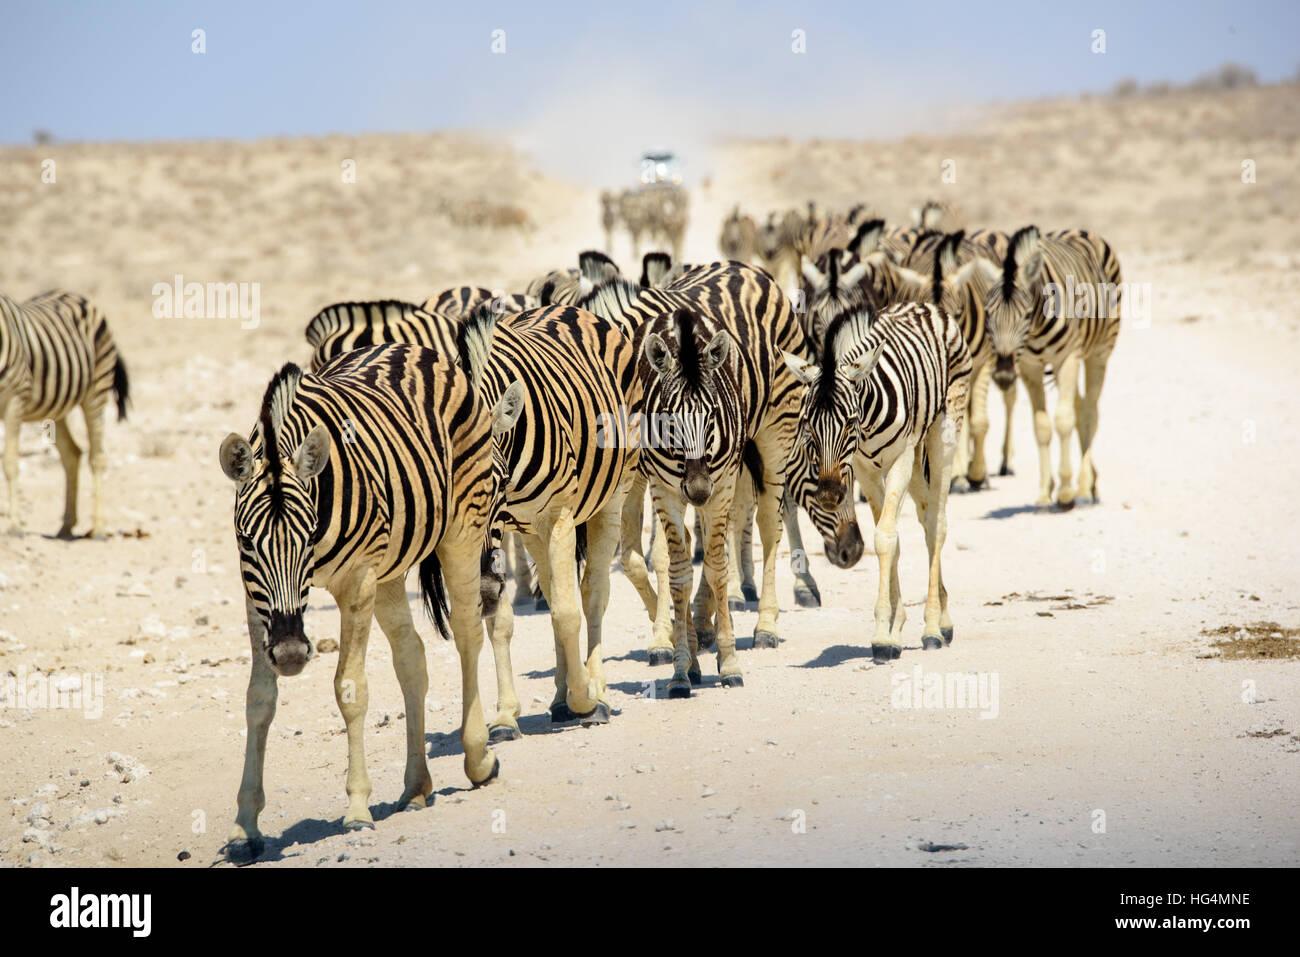 Herd of  Zebra approaching - Stock Image